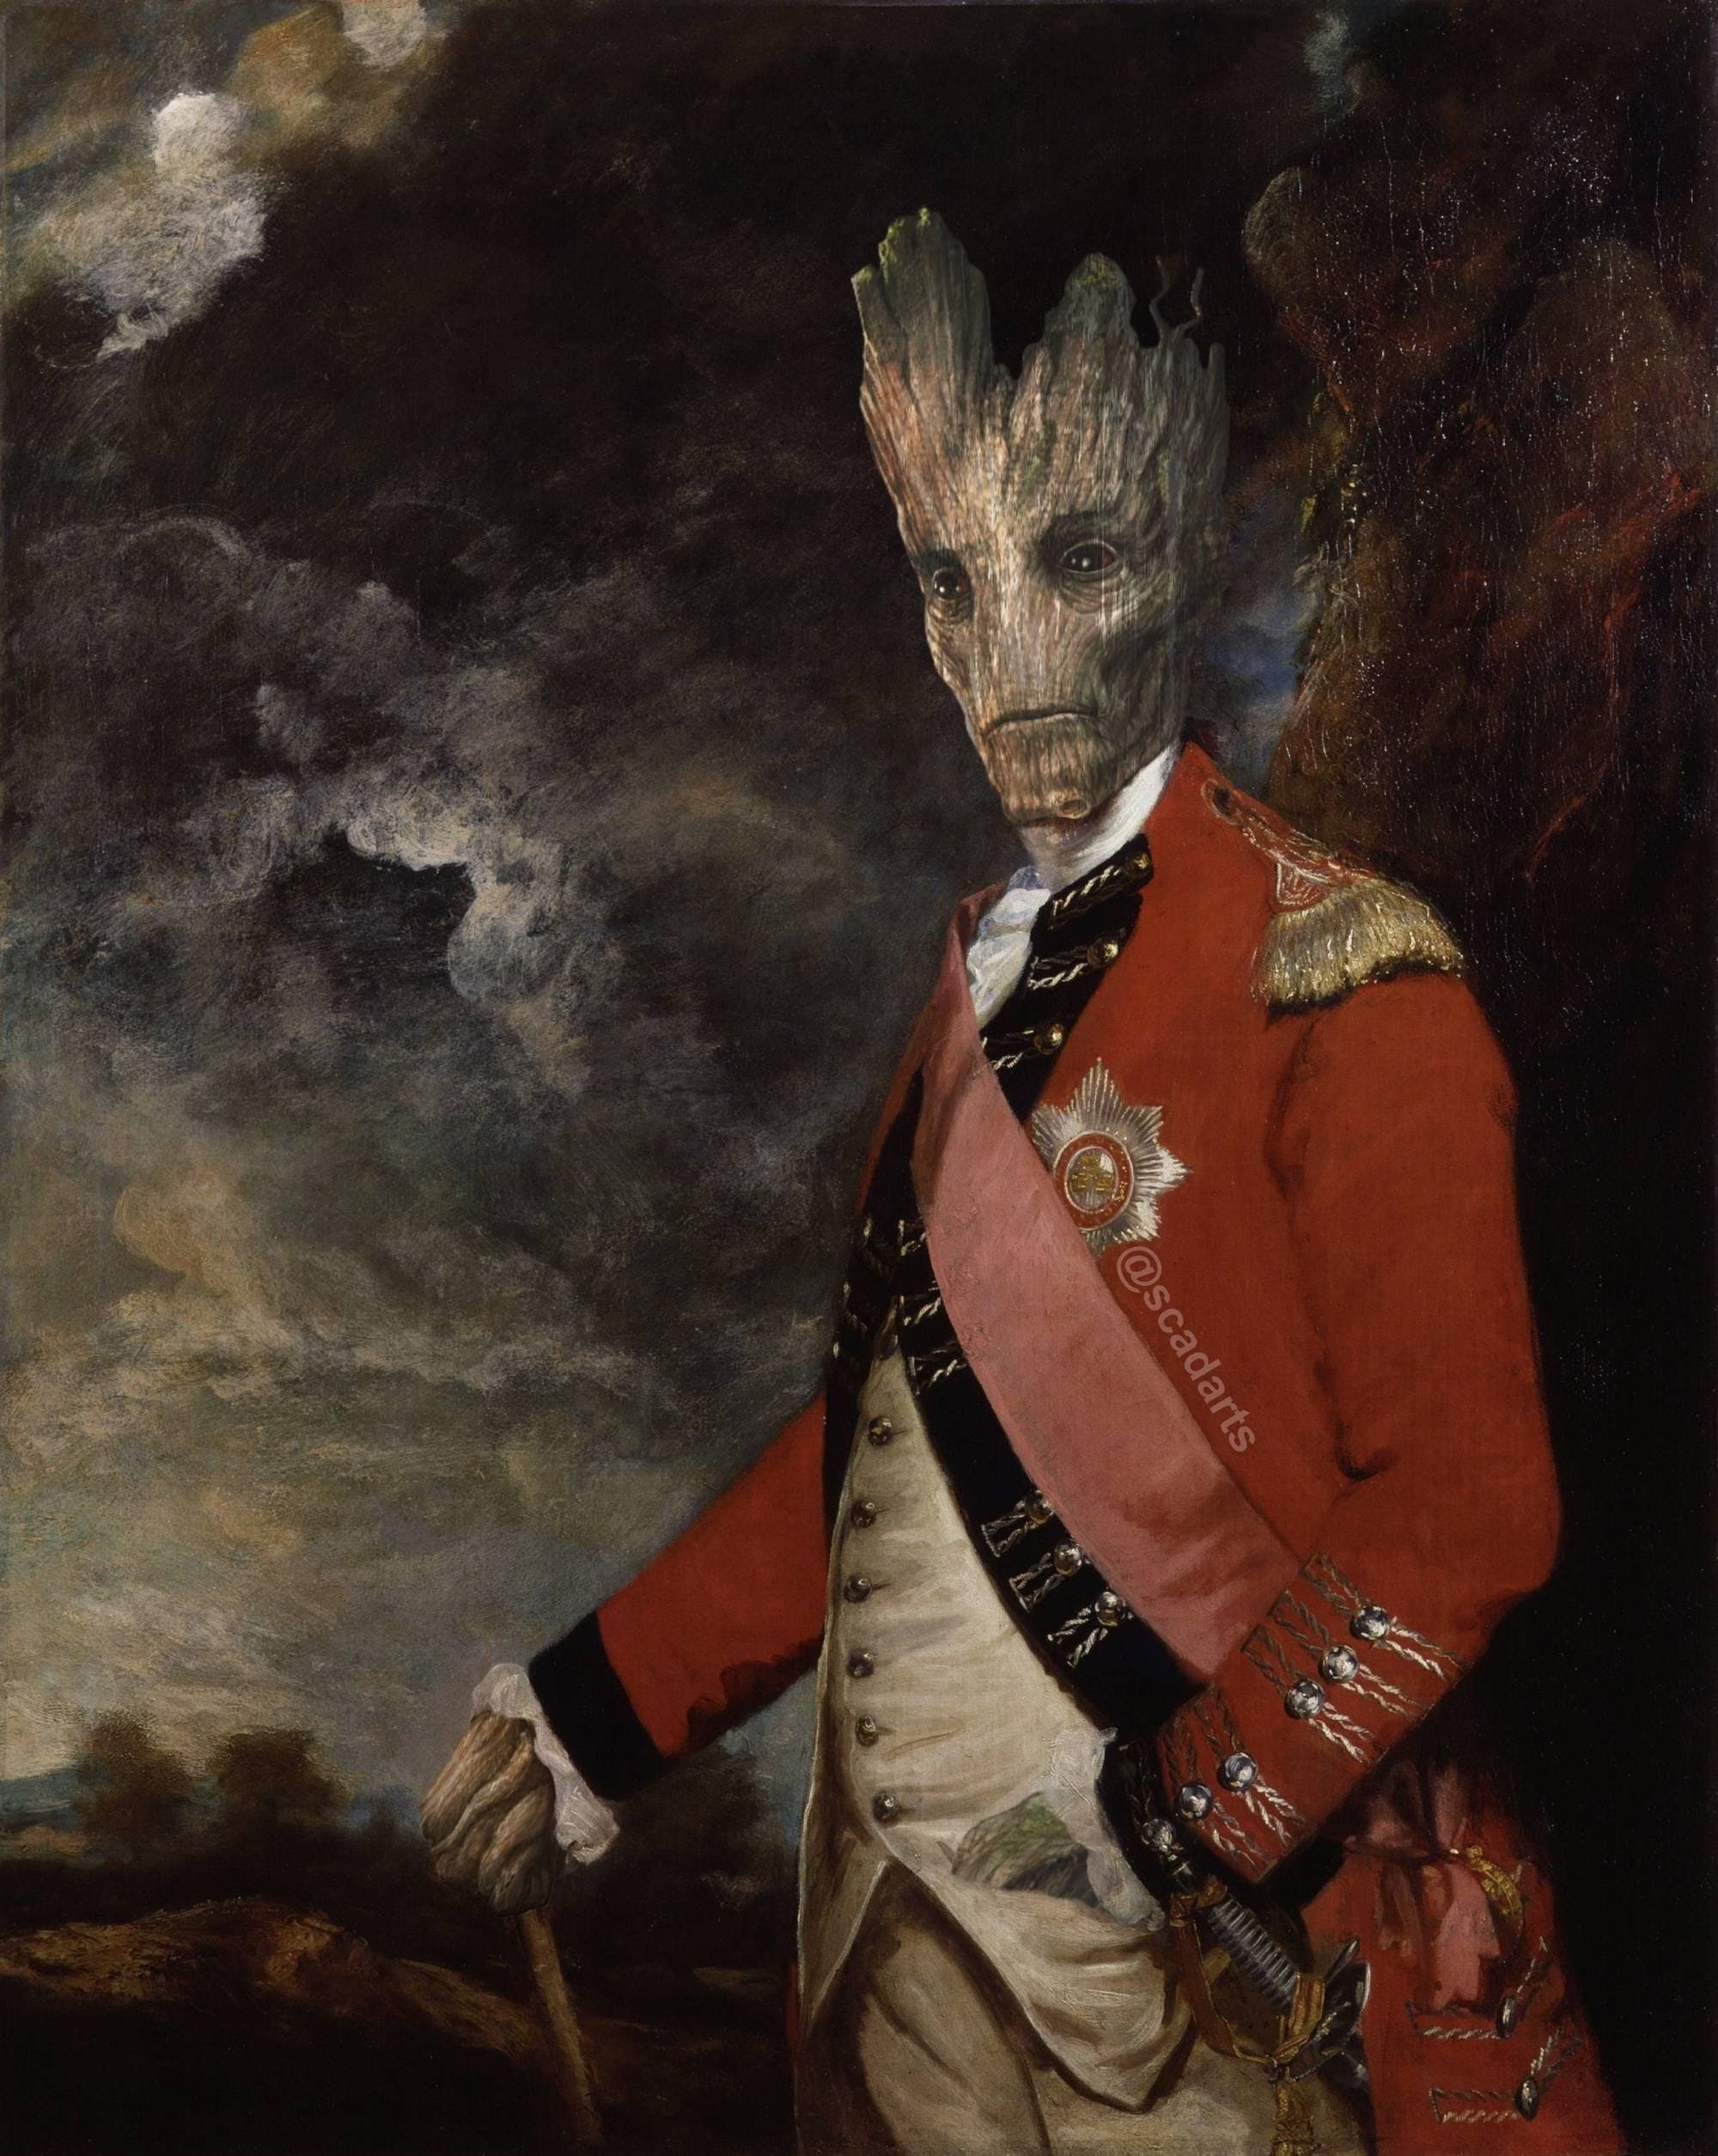 I am Groot : 1768年に開校したイギリス王立芸術院の初代校長をつとめた画家の故ジョシュア・レノルズが、同時期に軍隊で活躍していたグルート准将を描いた歴史的価値のある肖像画😄